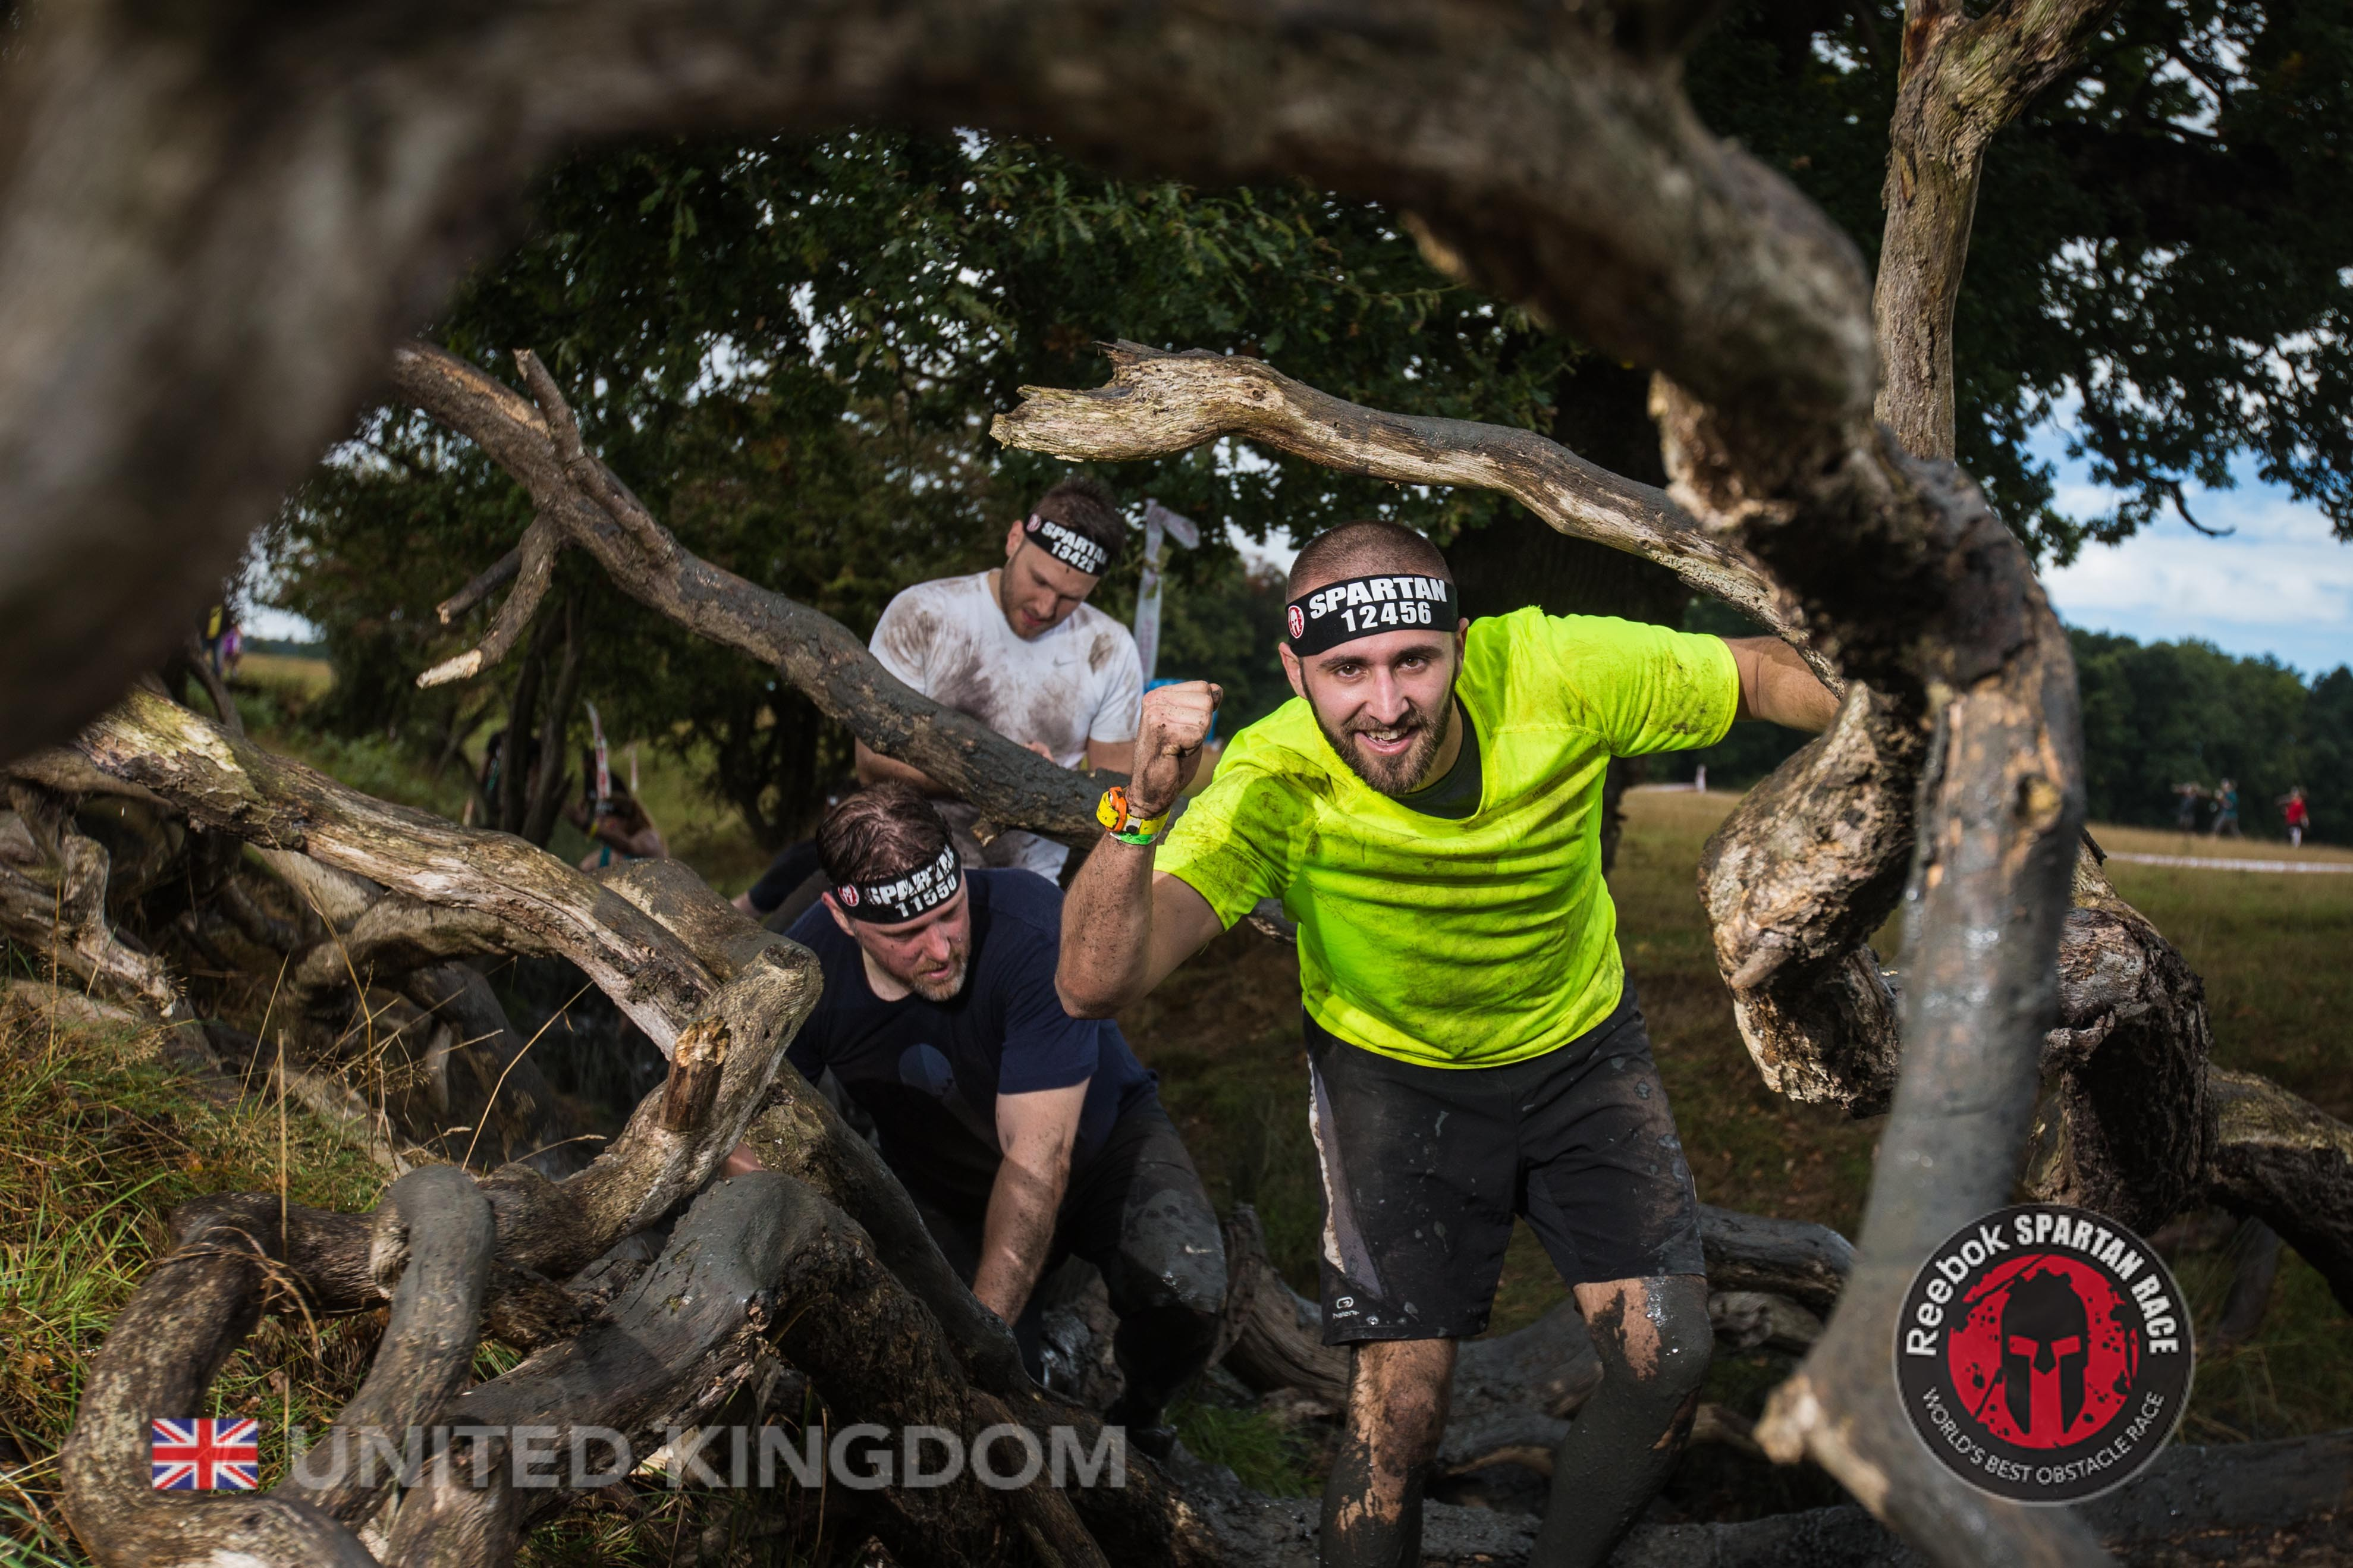 Spartan Race UK \u002D Windsor Trifecta Weekend - cover image